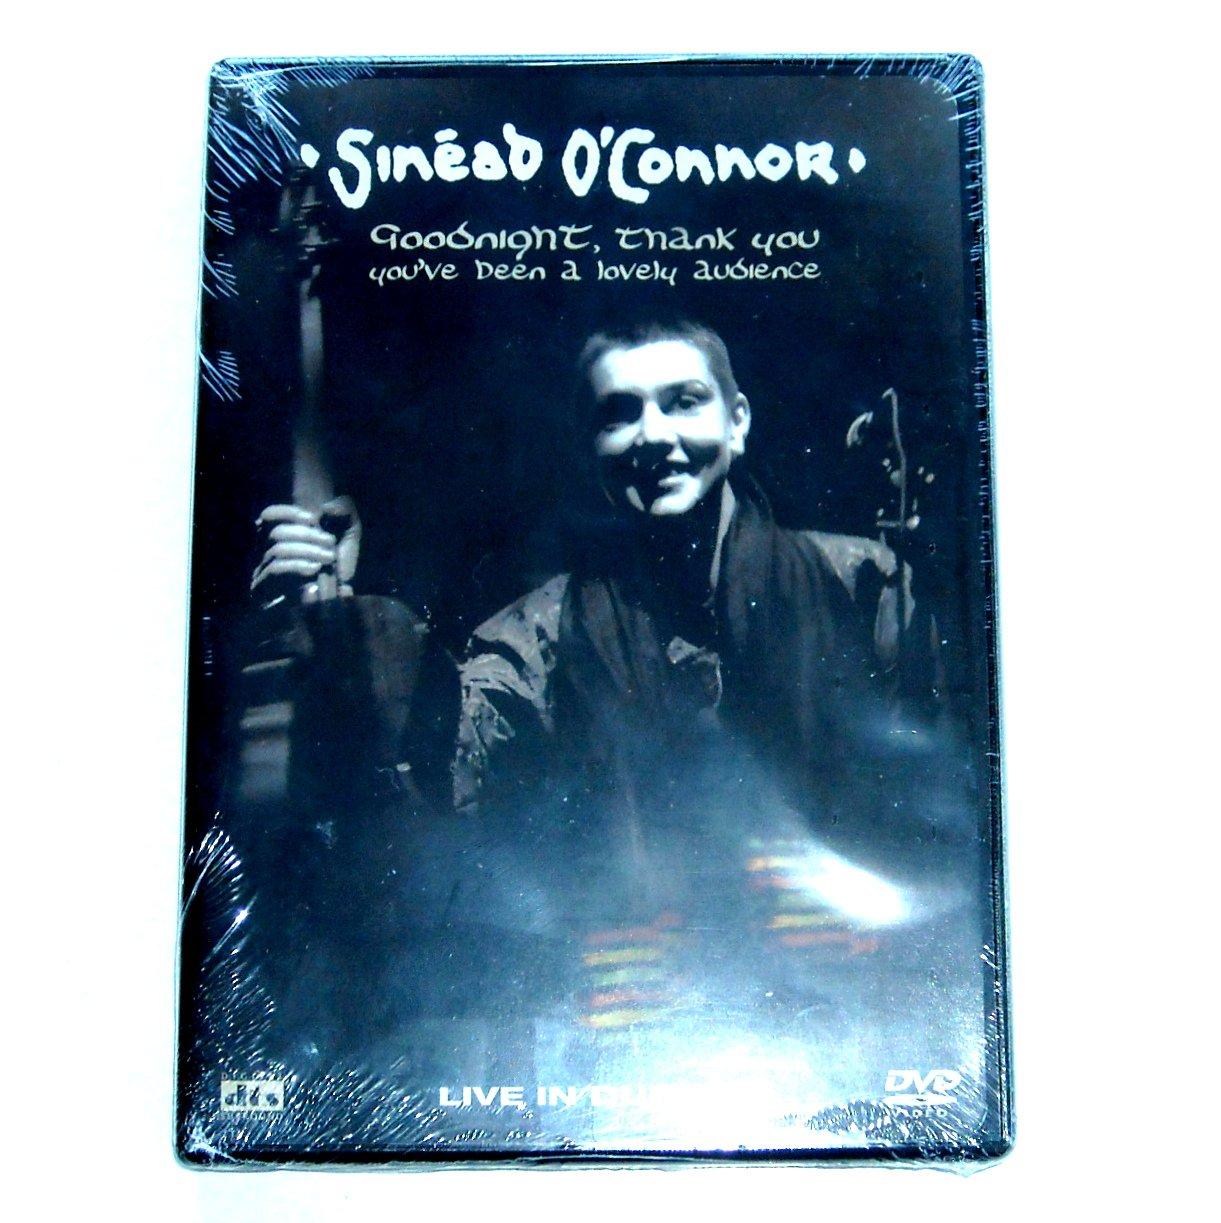 Sinead O'Connor live in Dublin DVD